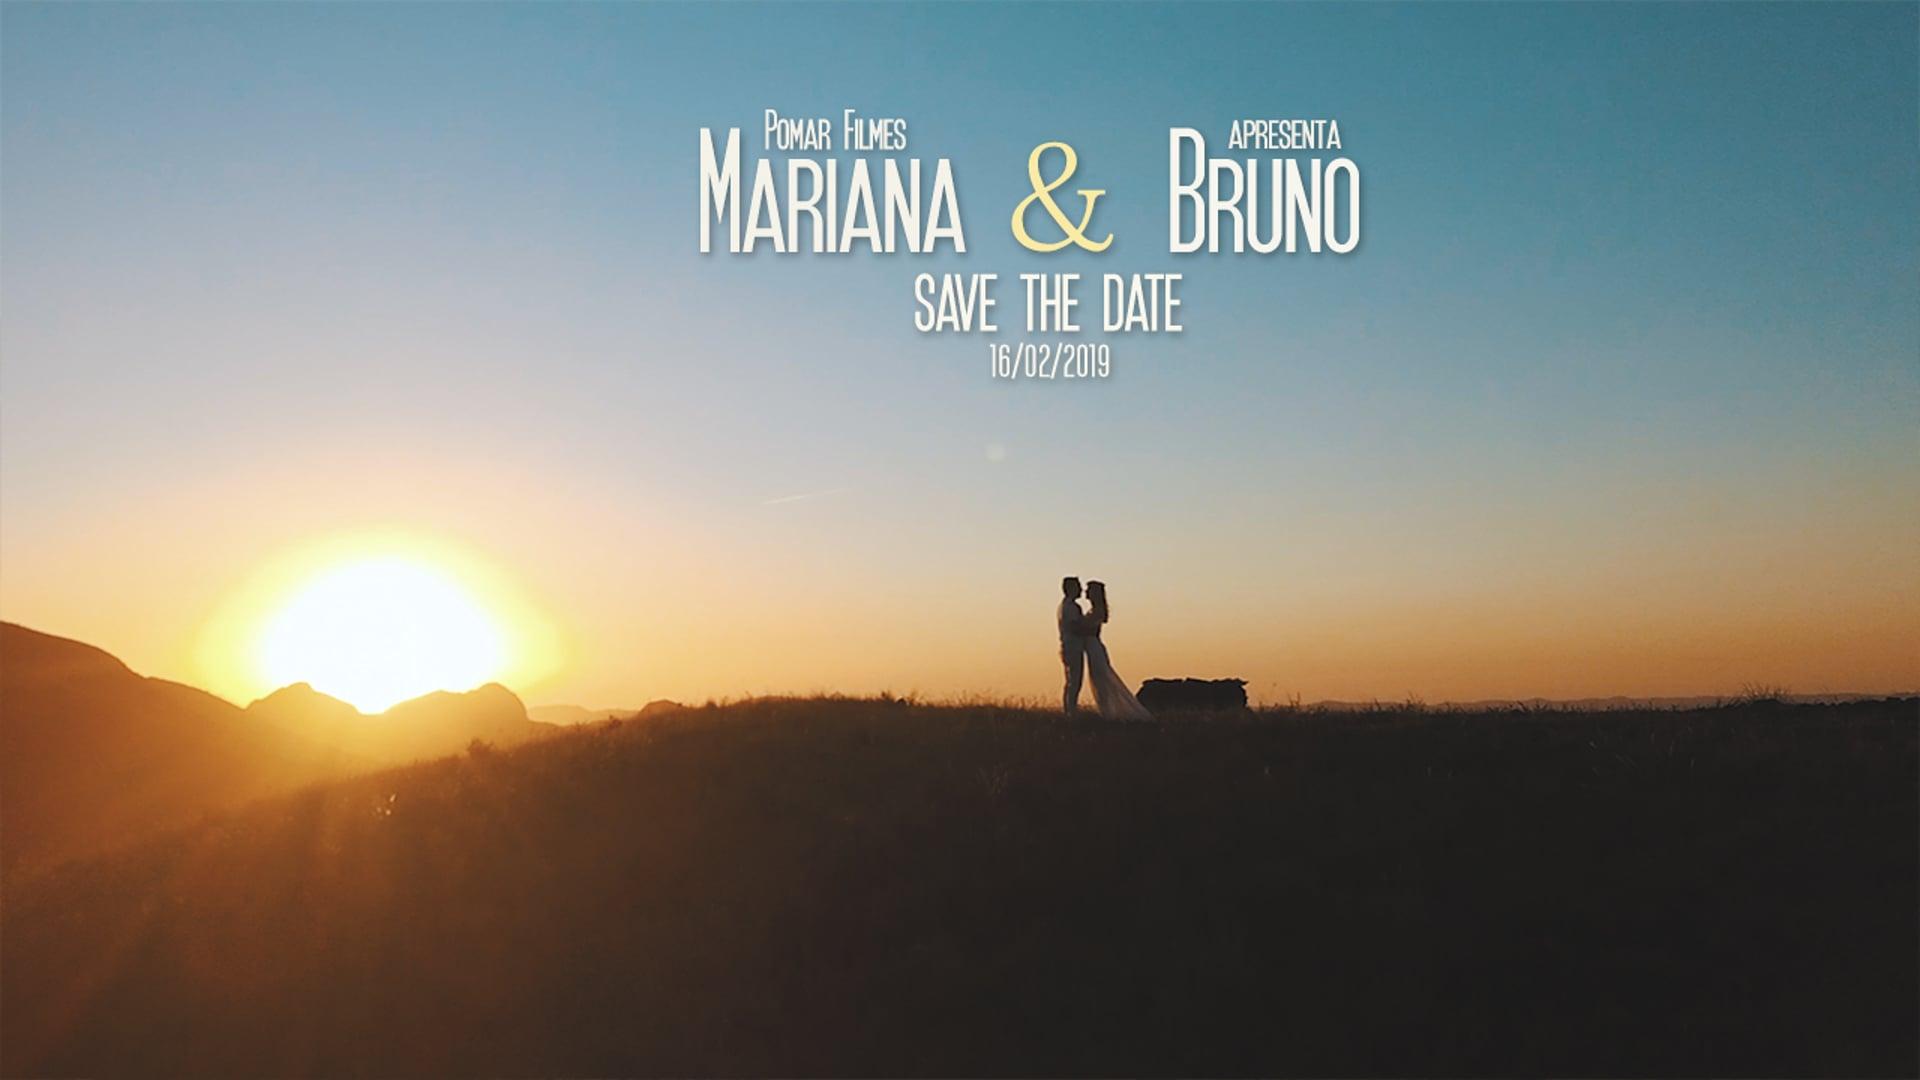 Save The Date Mariana e Bruno - Inhotim